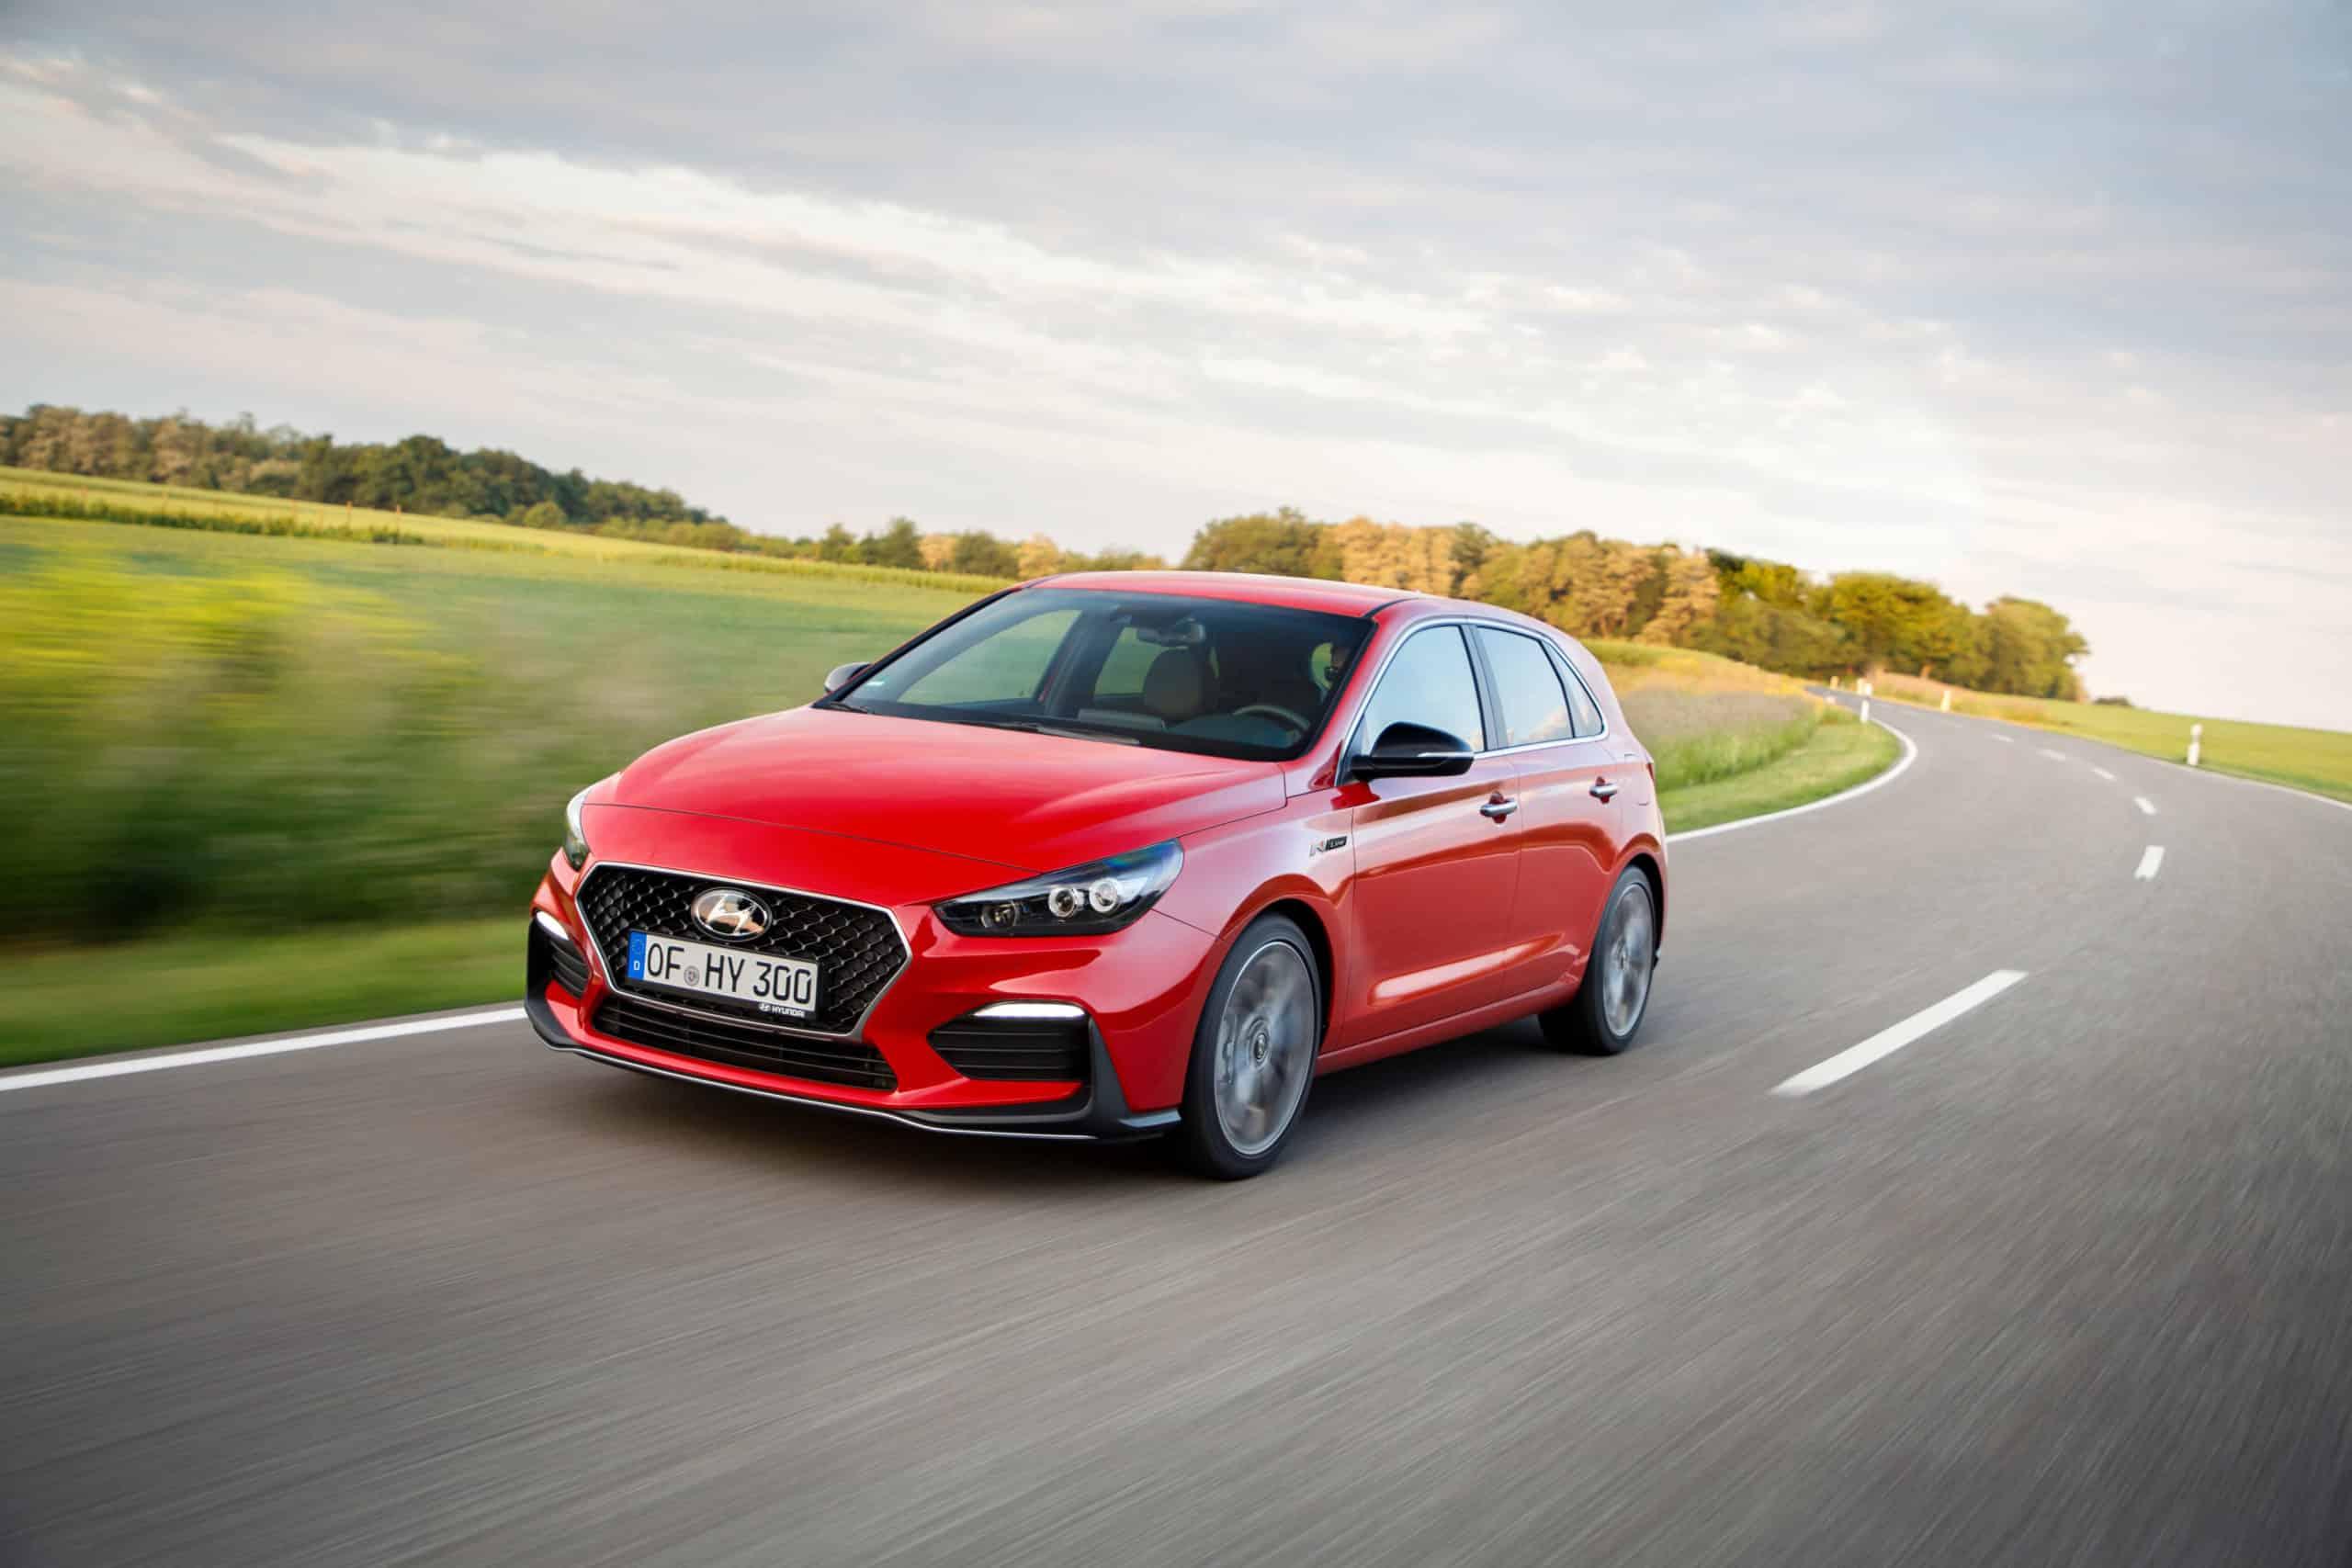 Hyundai i30 1.4 YES! Leasing für 66,39 Euro im Monat netto